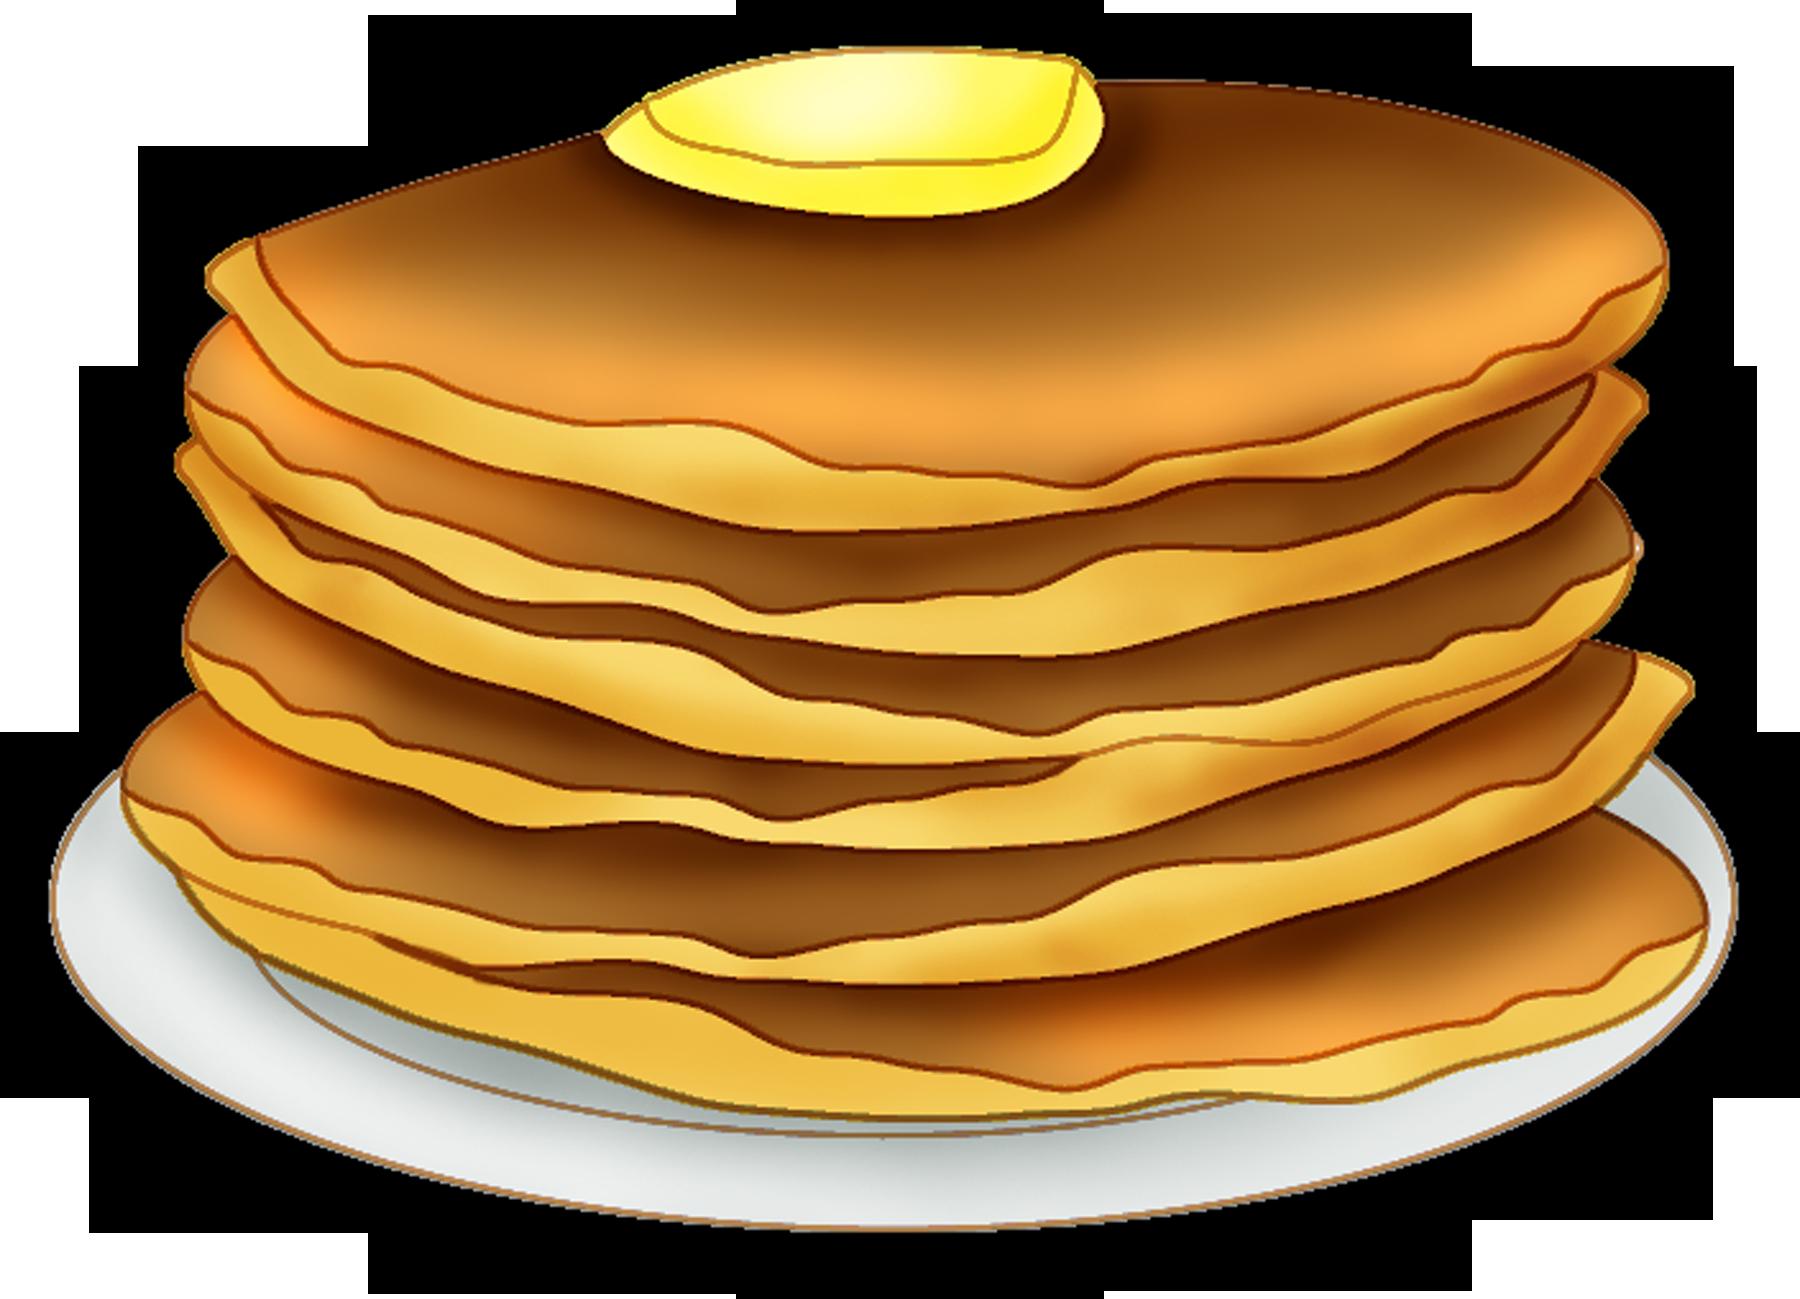 Images Pancakes Clipart Page 2 U0026midd-Images Pancakes Clipart Page 2 u0026middot; Pancake Clipart Free-6